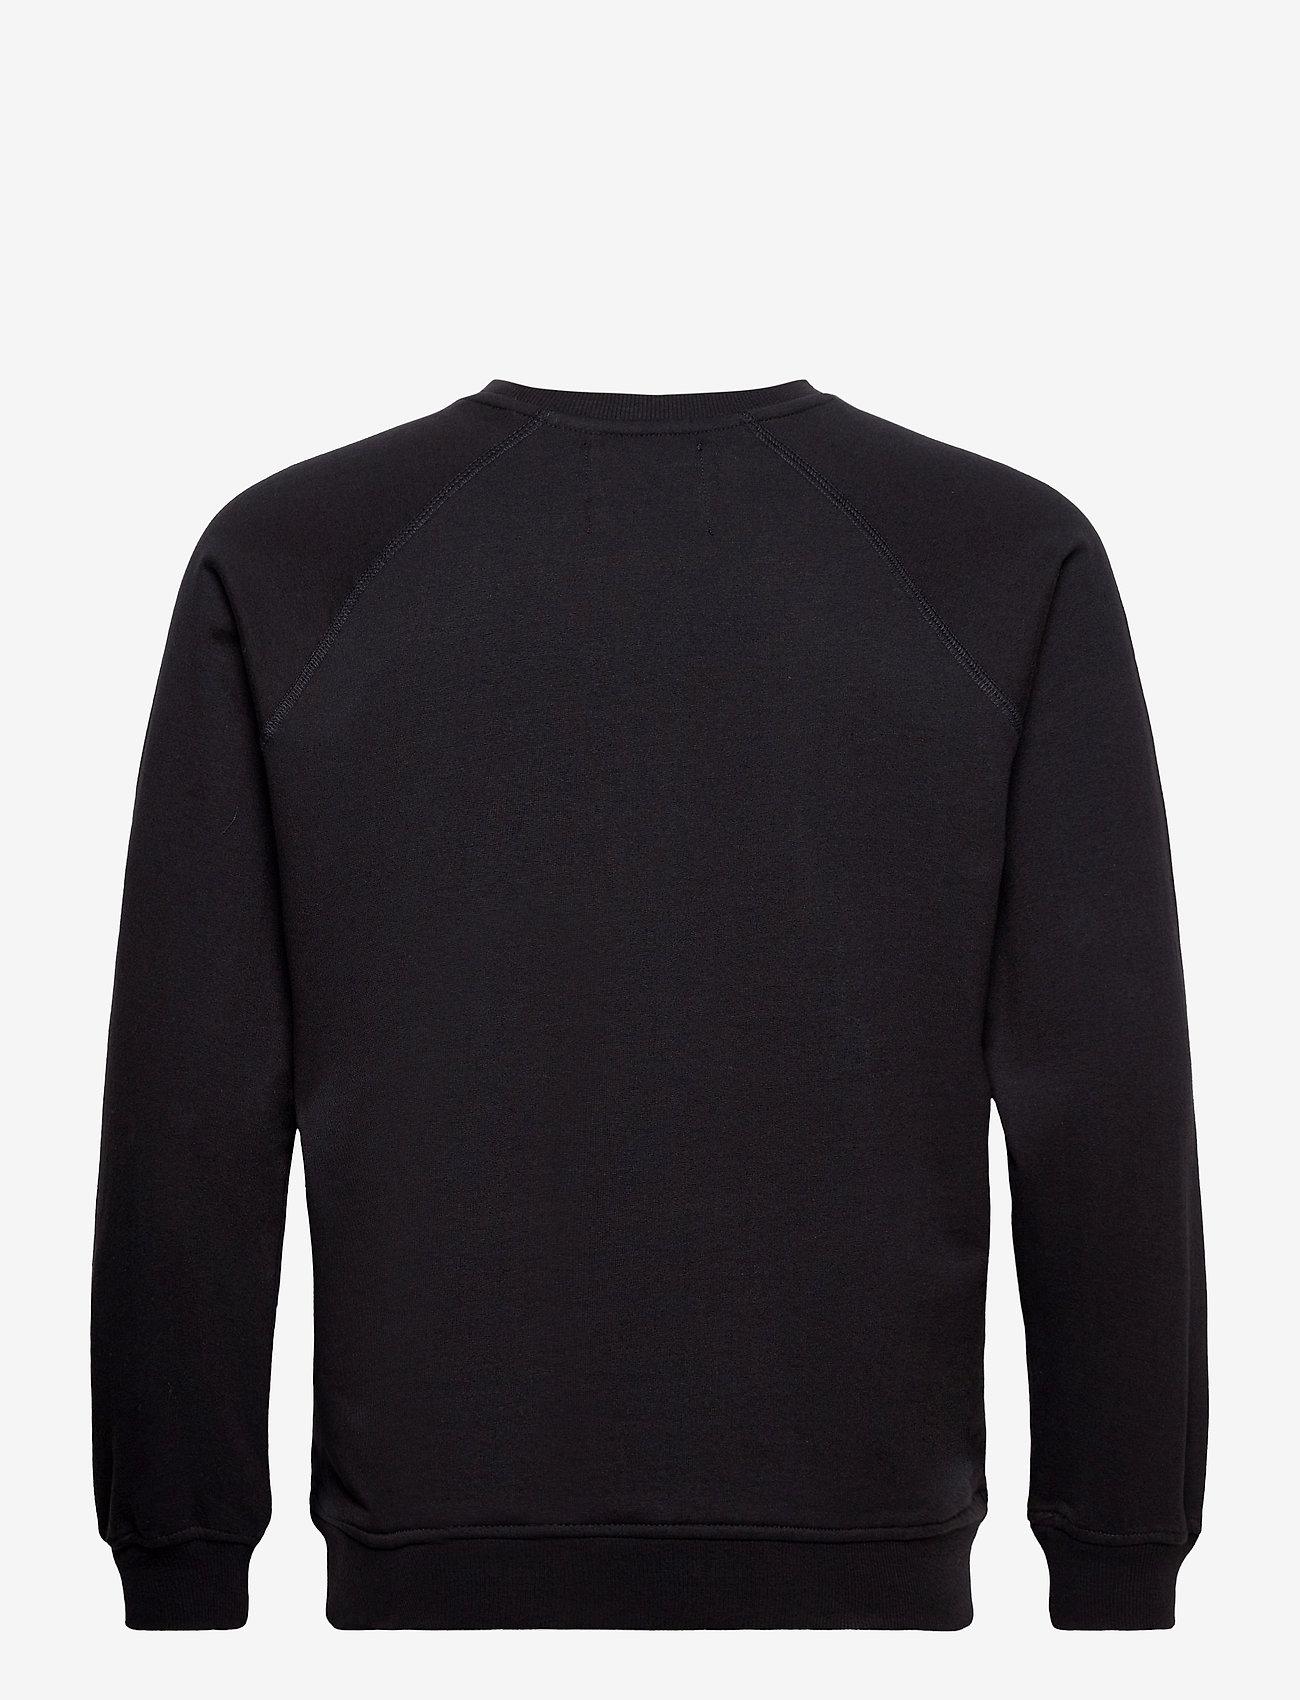 Denim project - BASIC SWEAT CREW - basic sweatshirts - 008 navy - 1